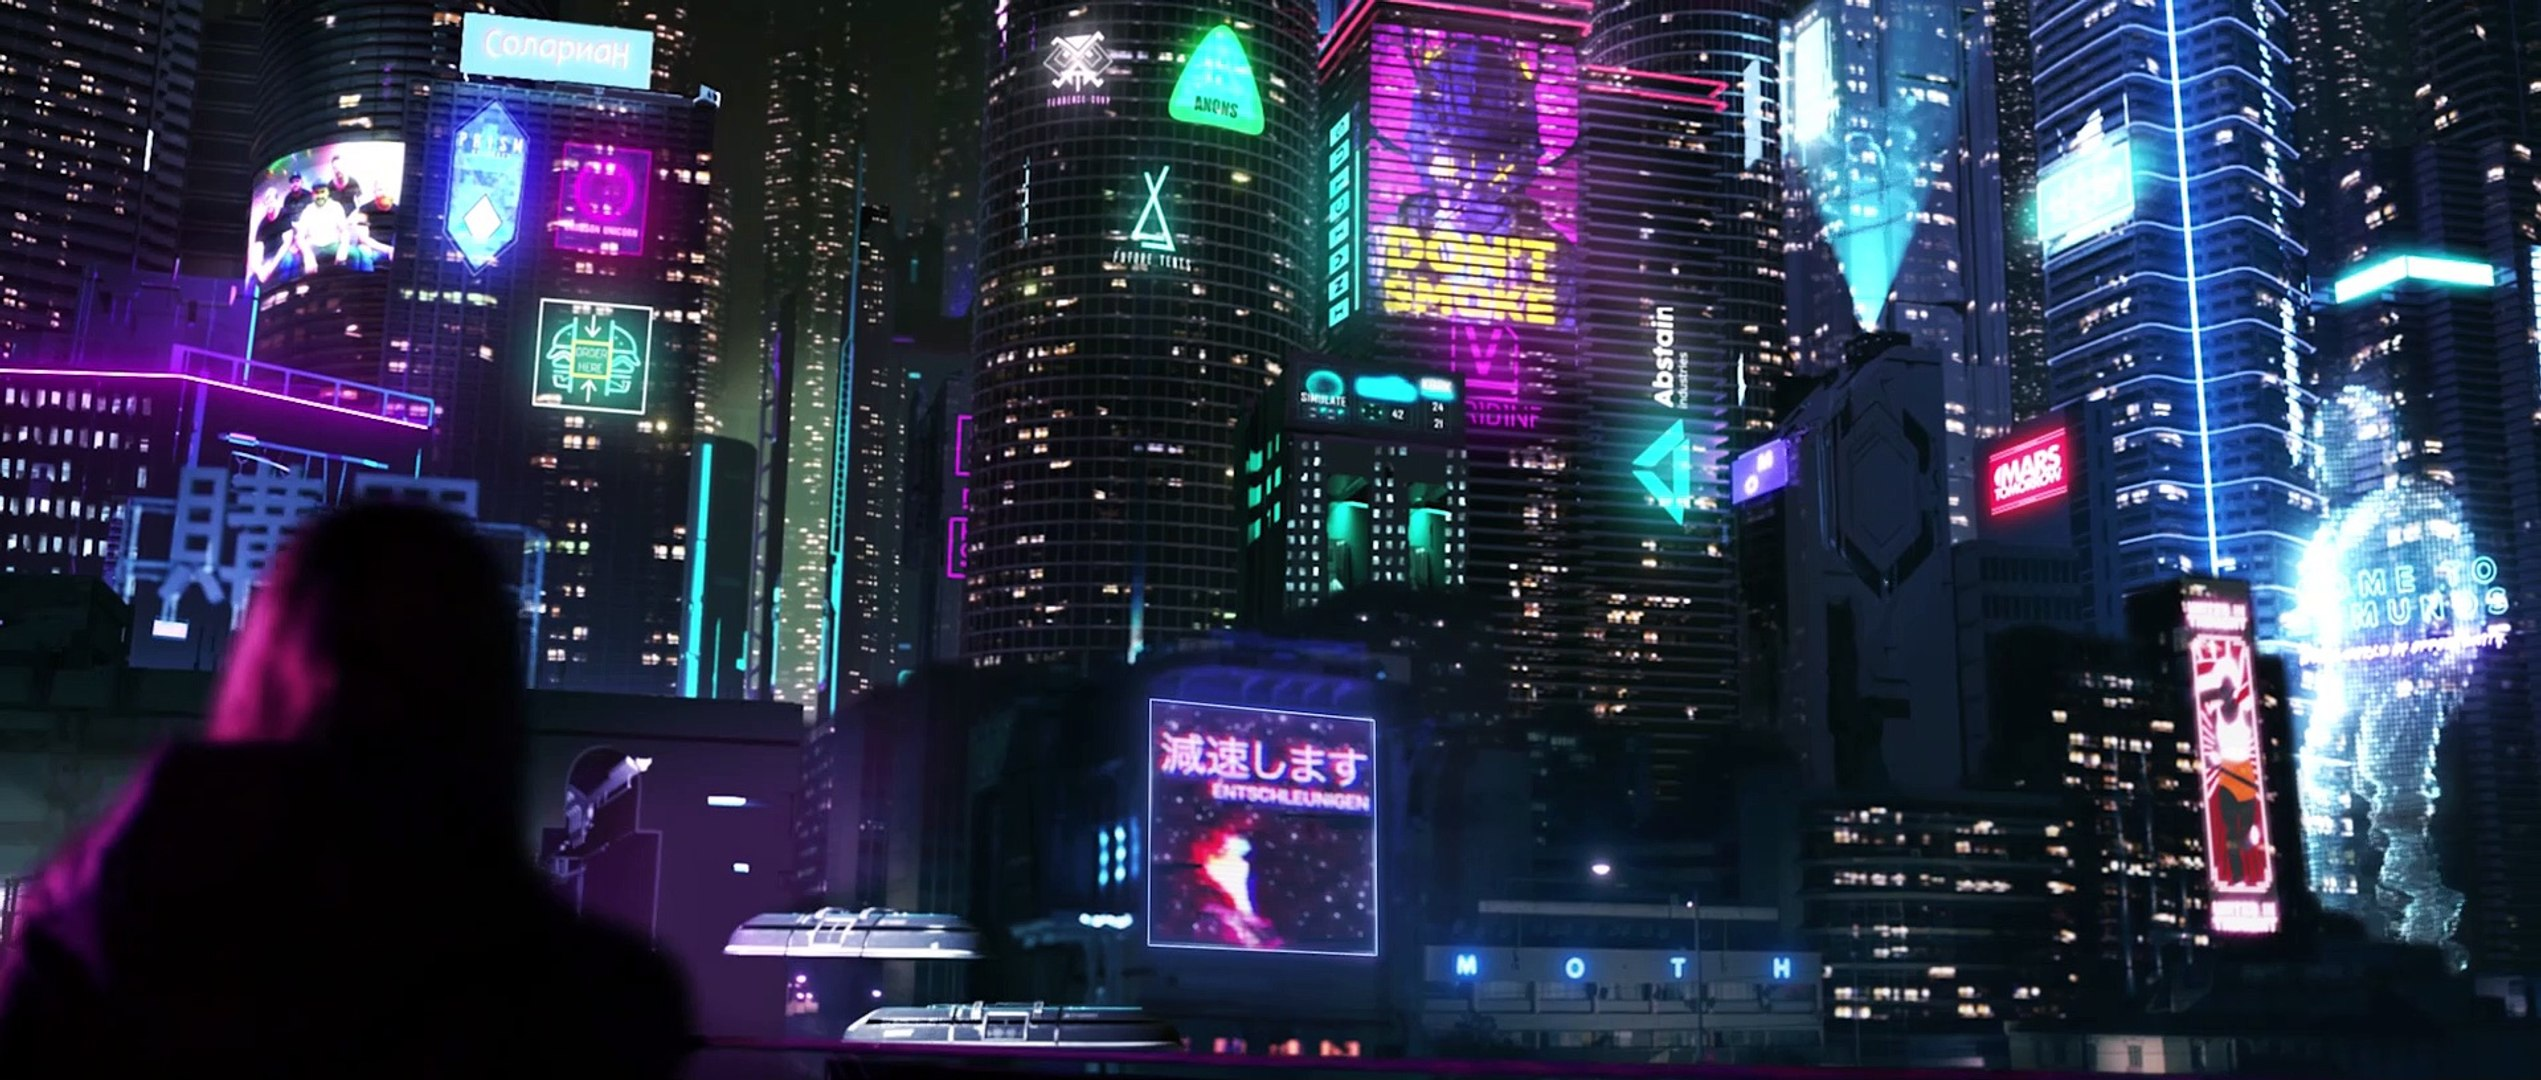 A cityscape in an Opera browser short Sci-fi film